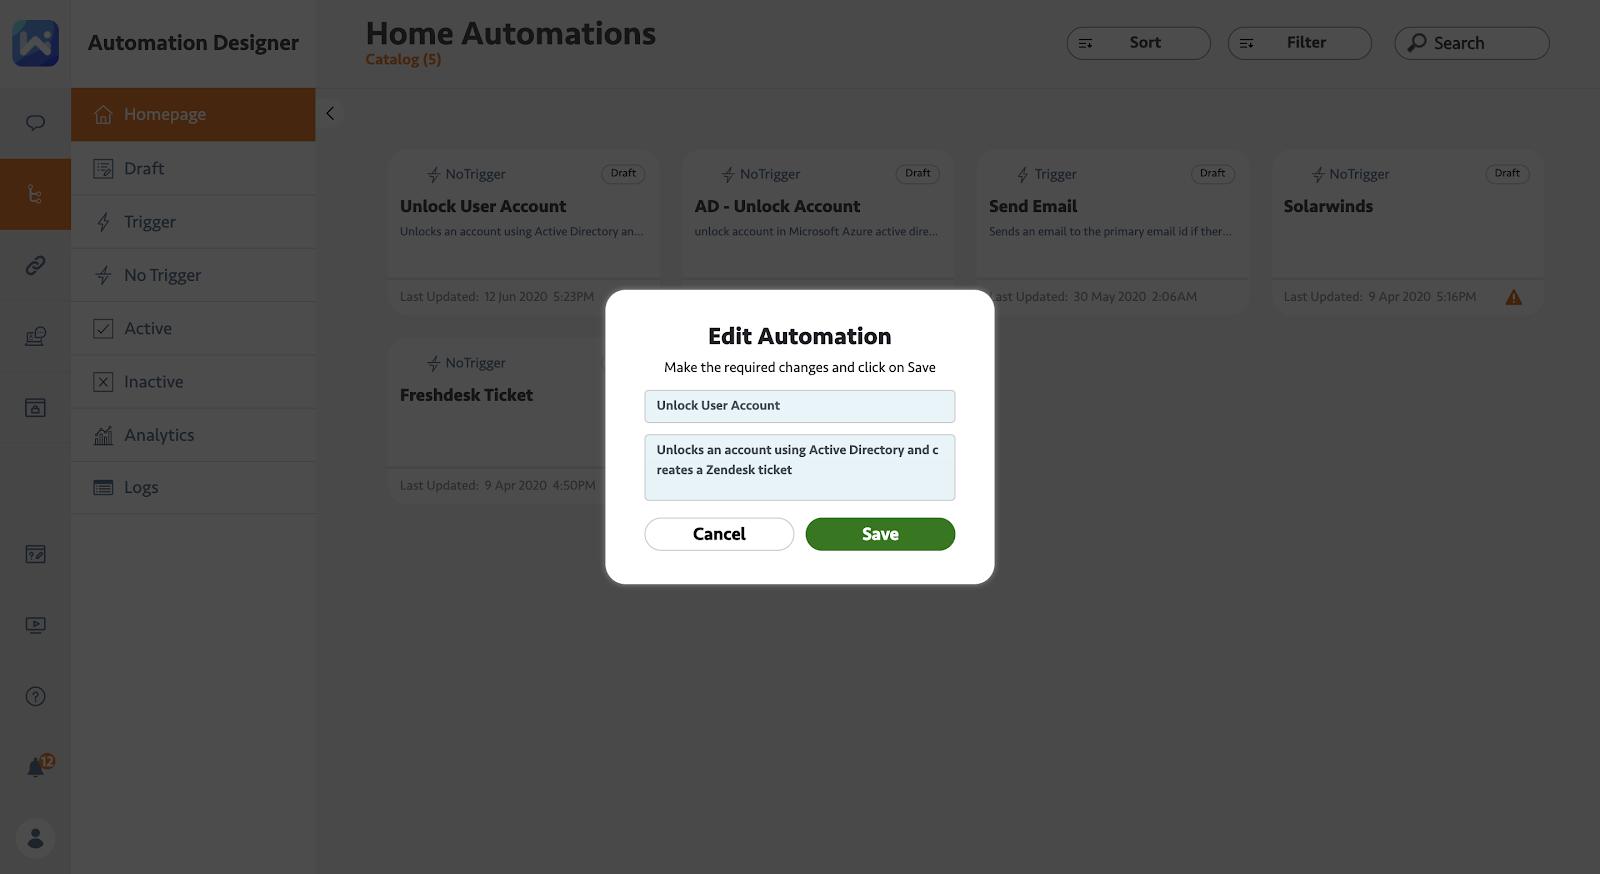 Edit Automation